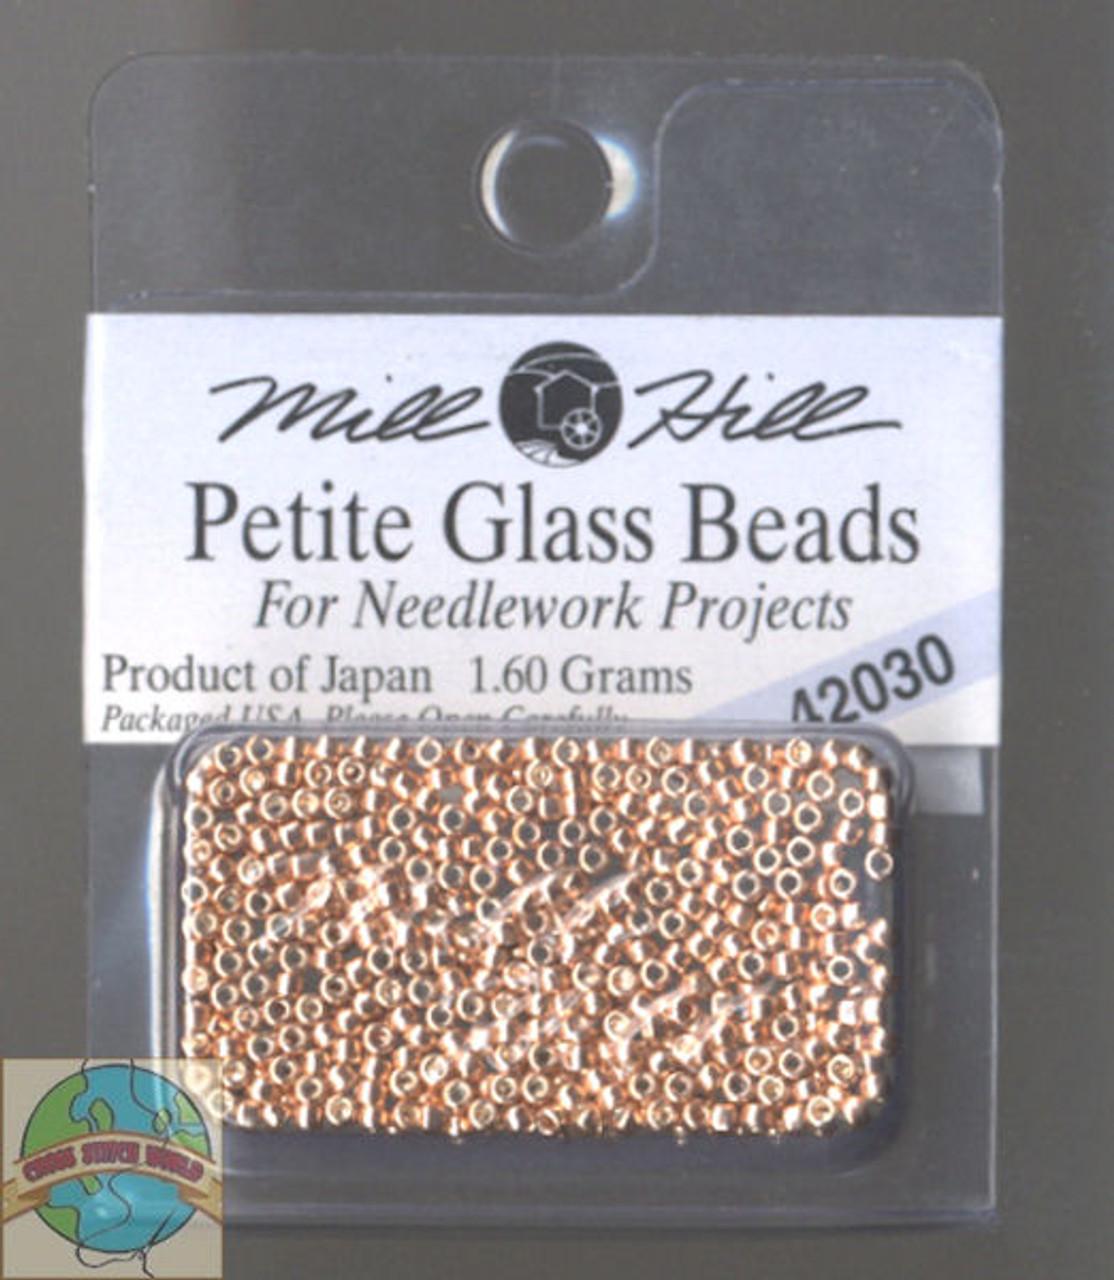 Mill Hill Petite Glass Bead 1.60g Victorian Copper